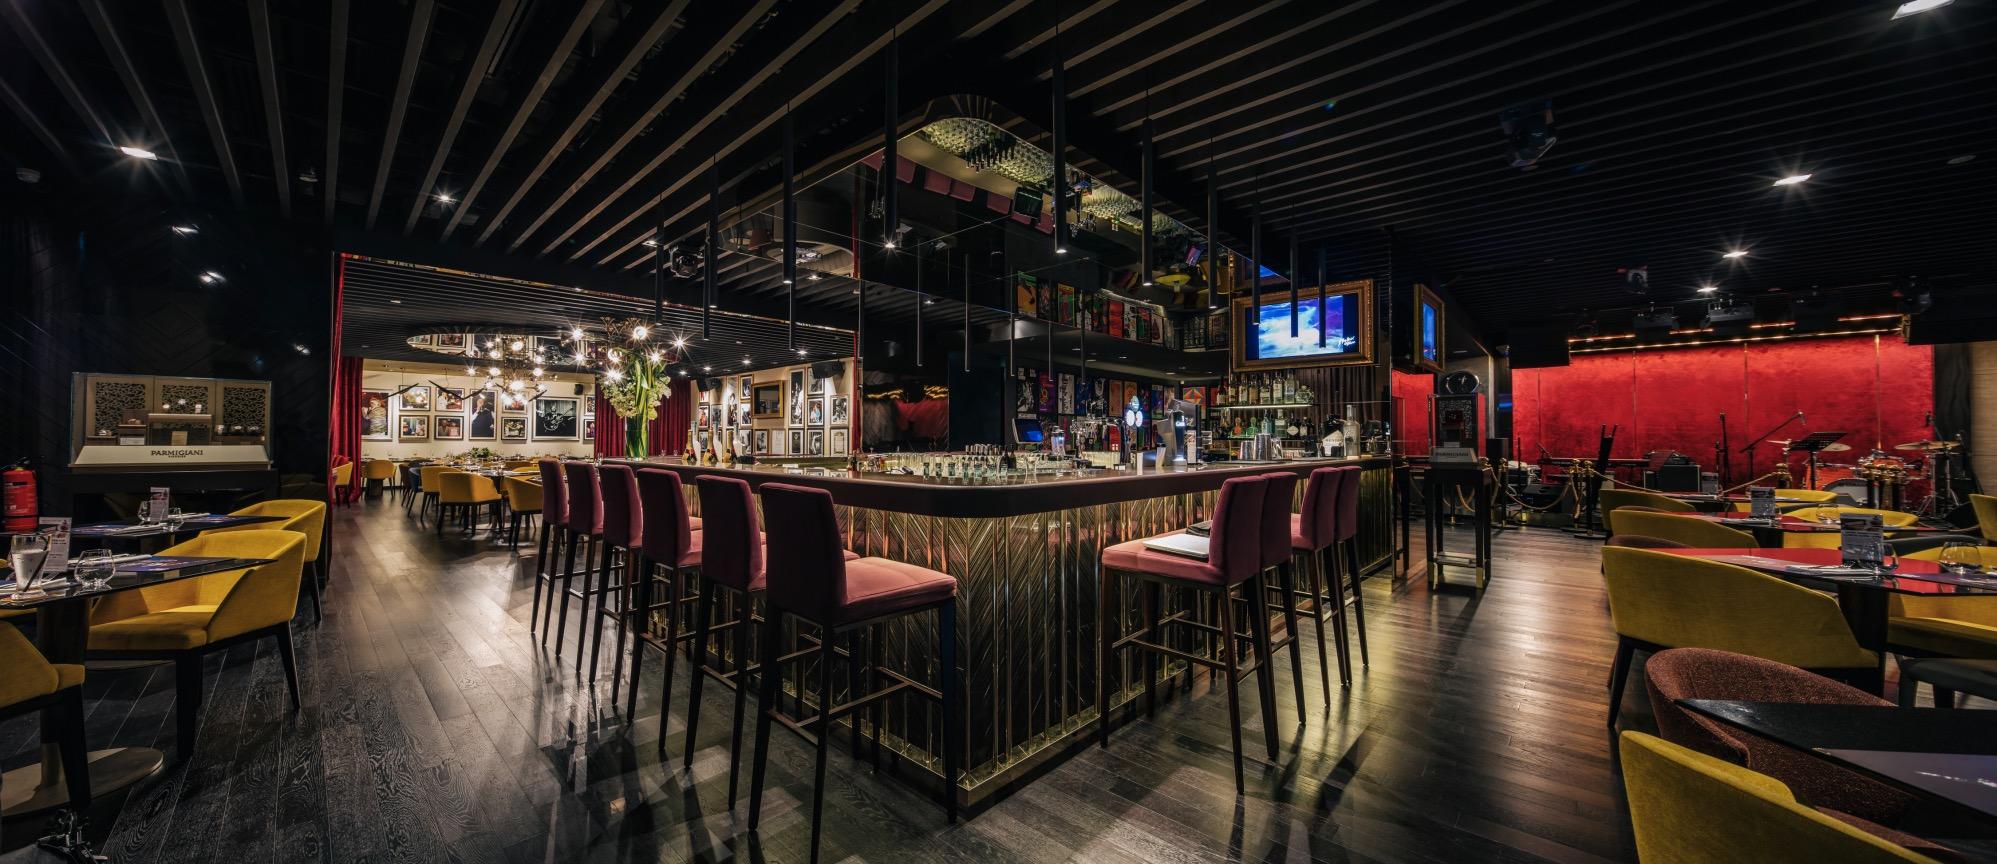 Montreux Jazz Cafe Menu Singapore